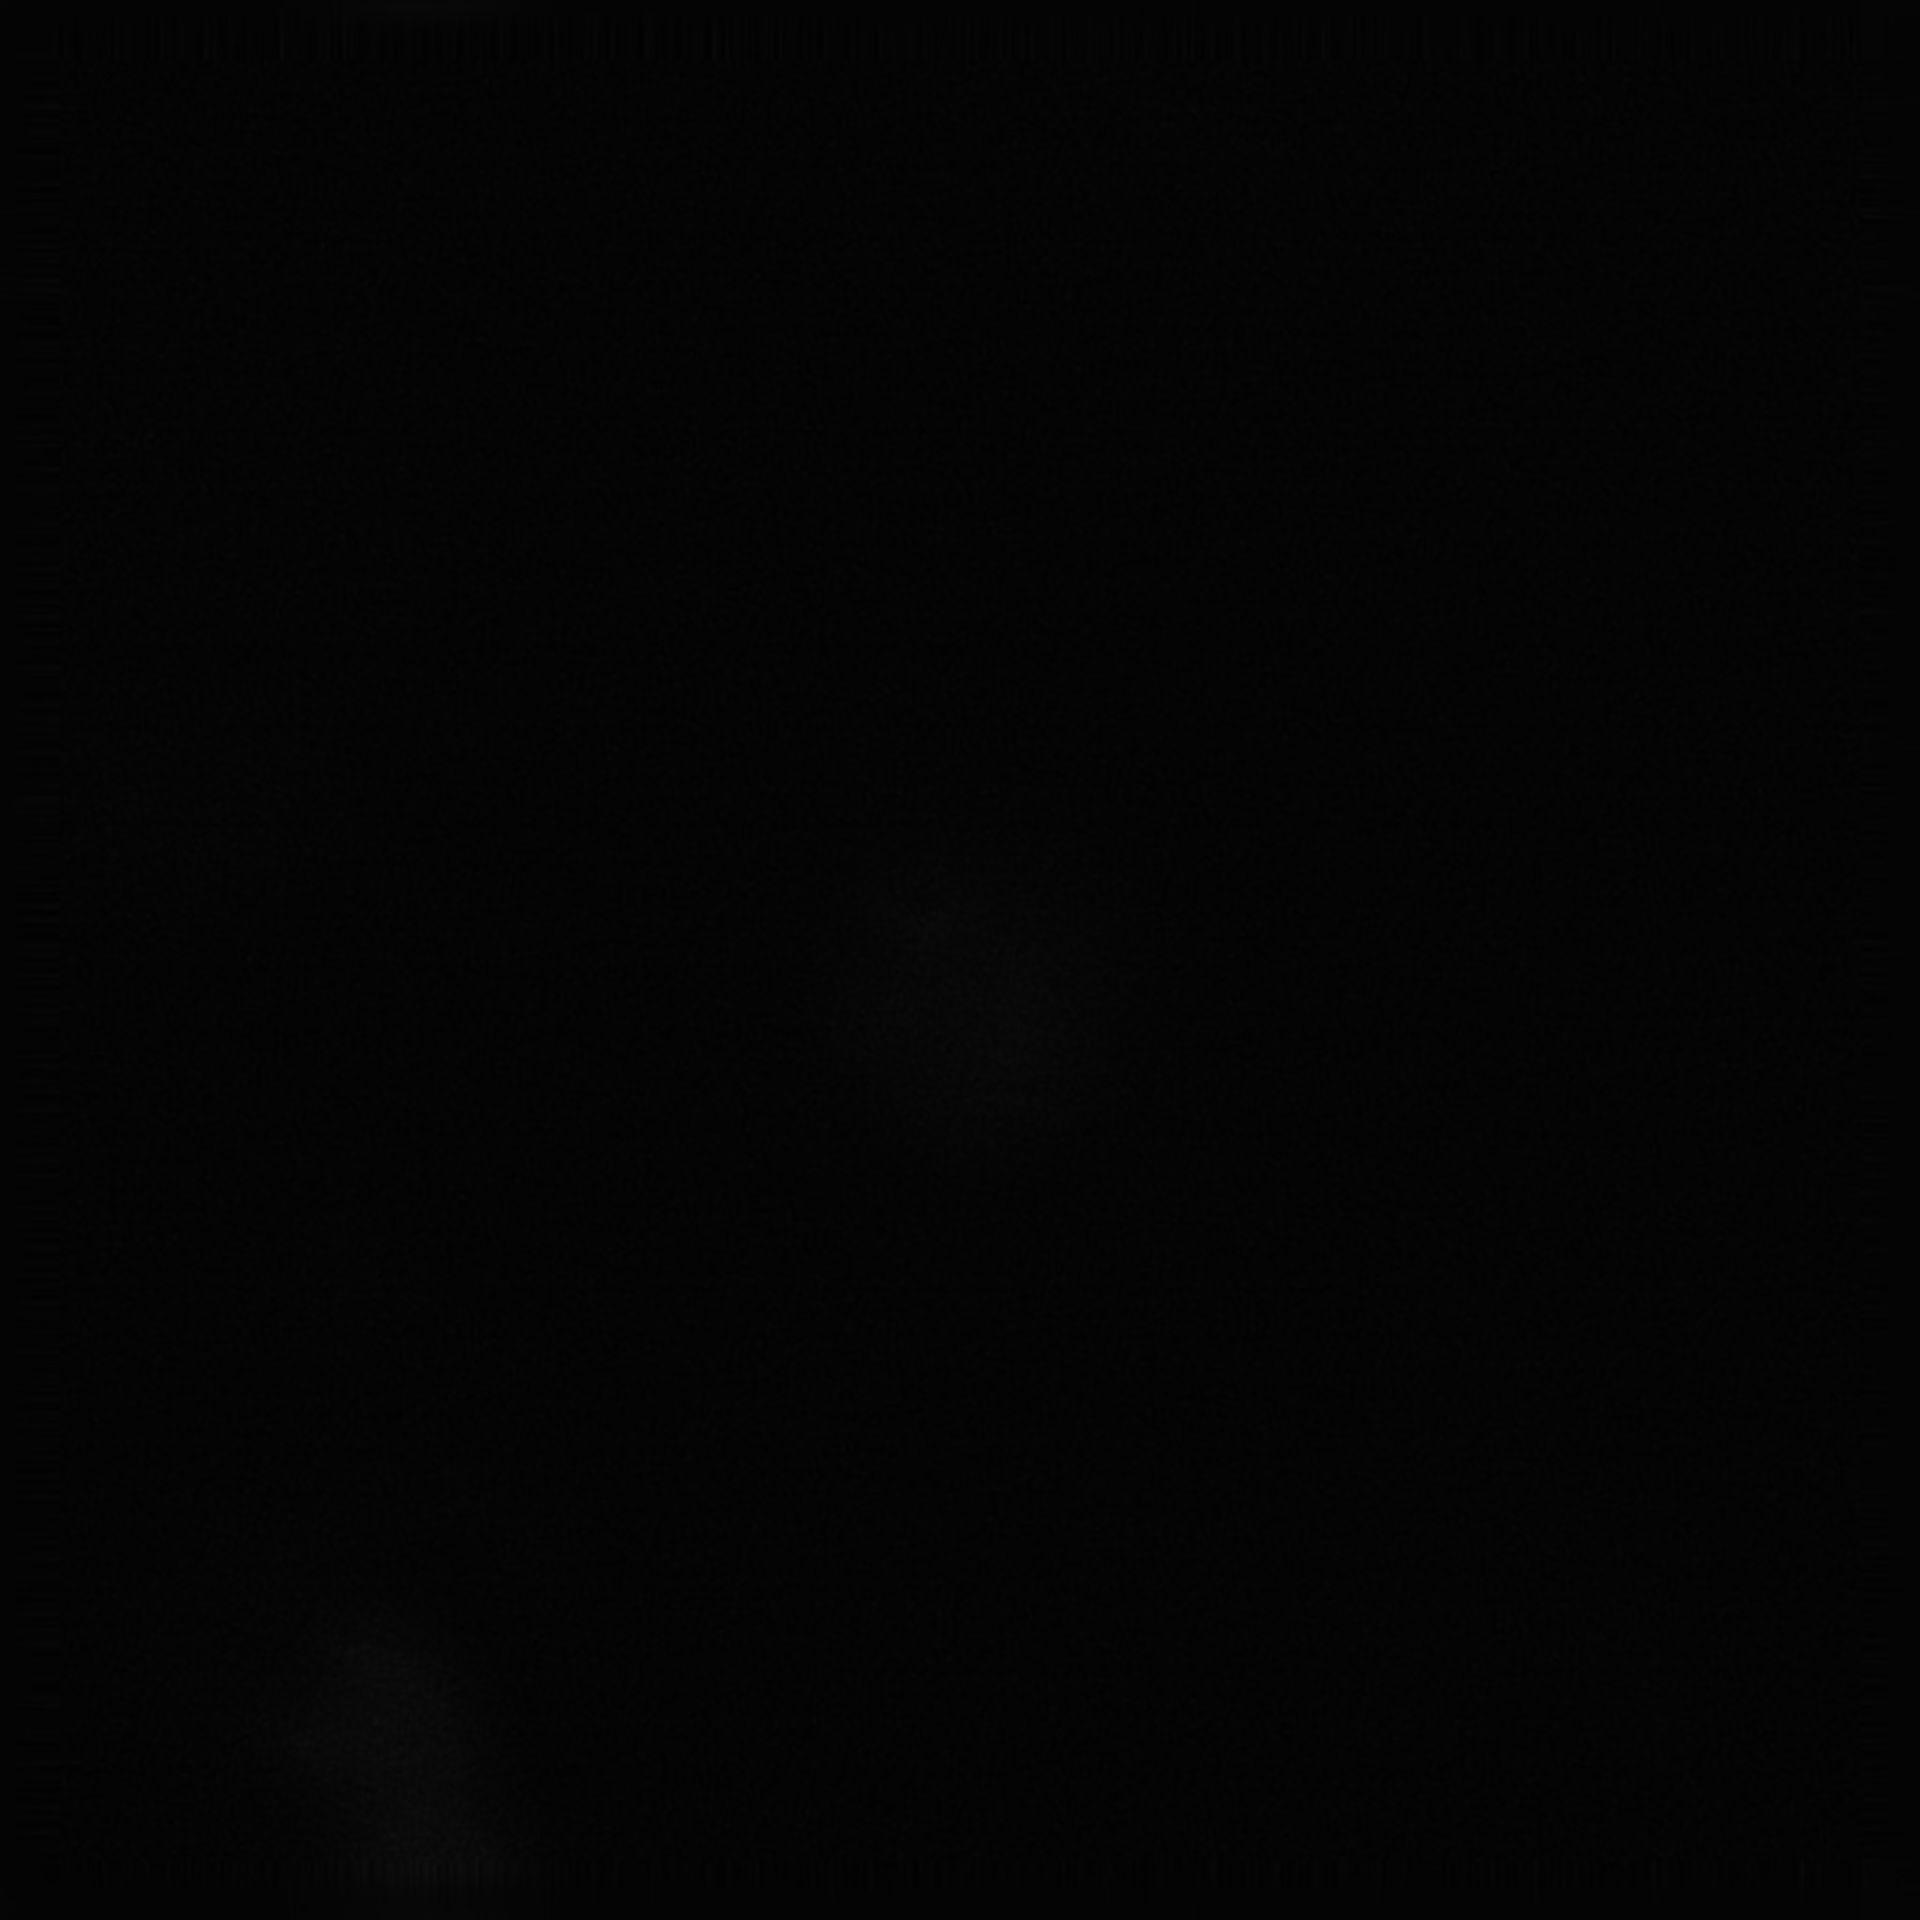 Toxoplasma gondii RH (Cortical microtubule) - CIL:10475